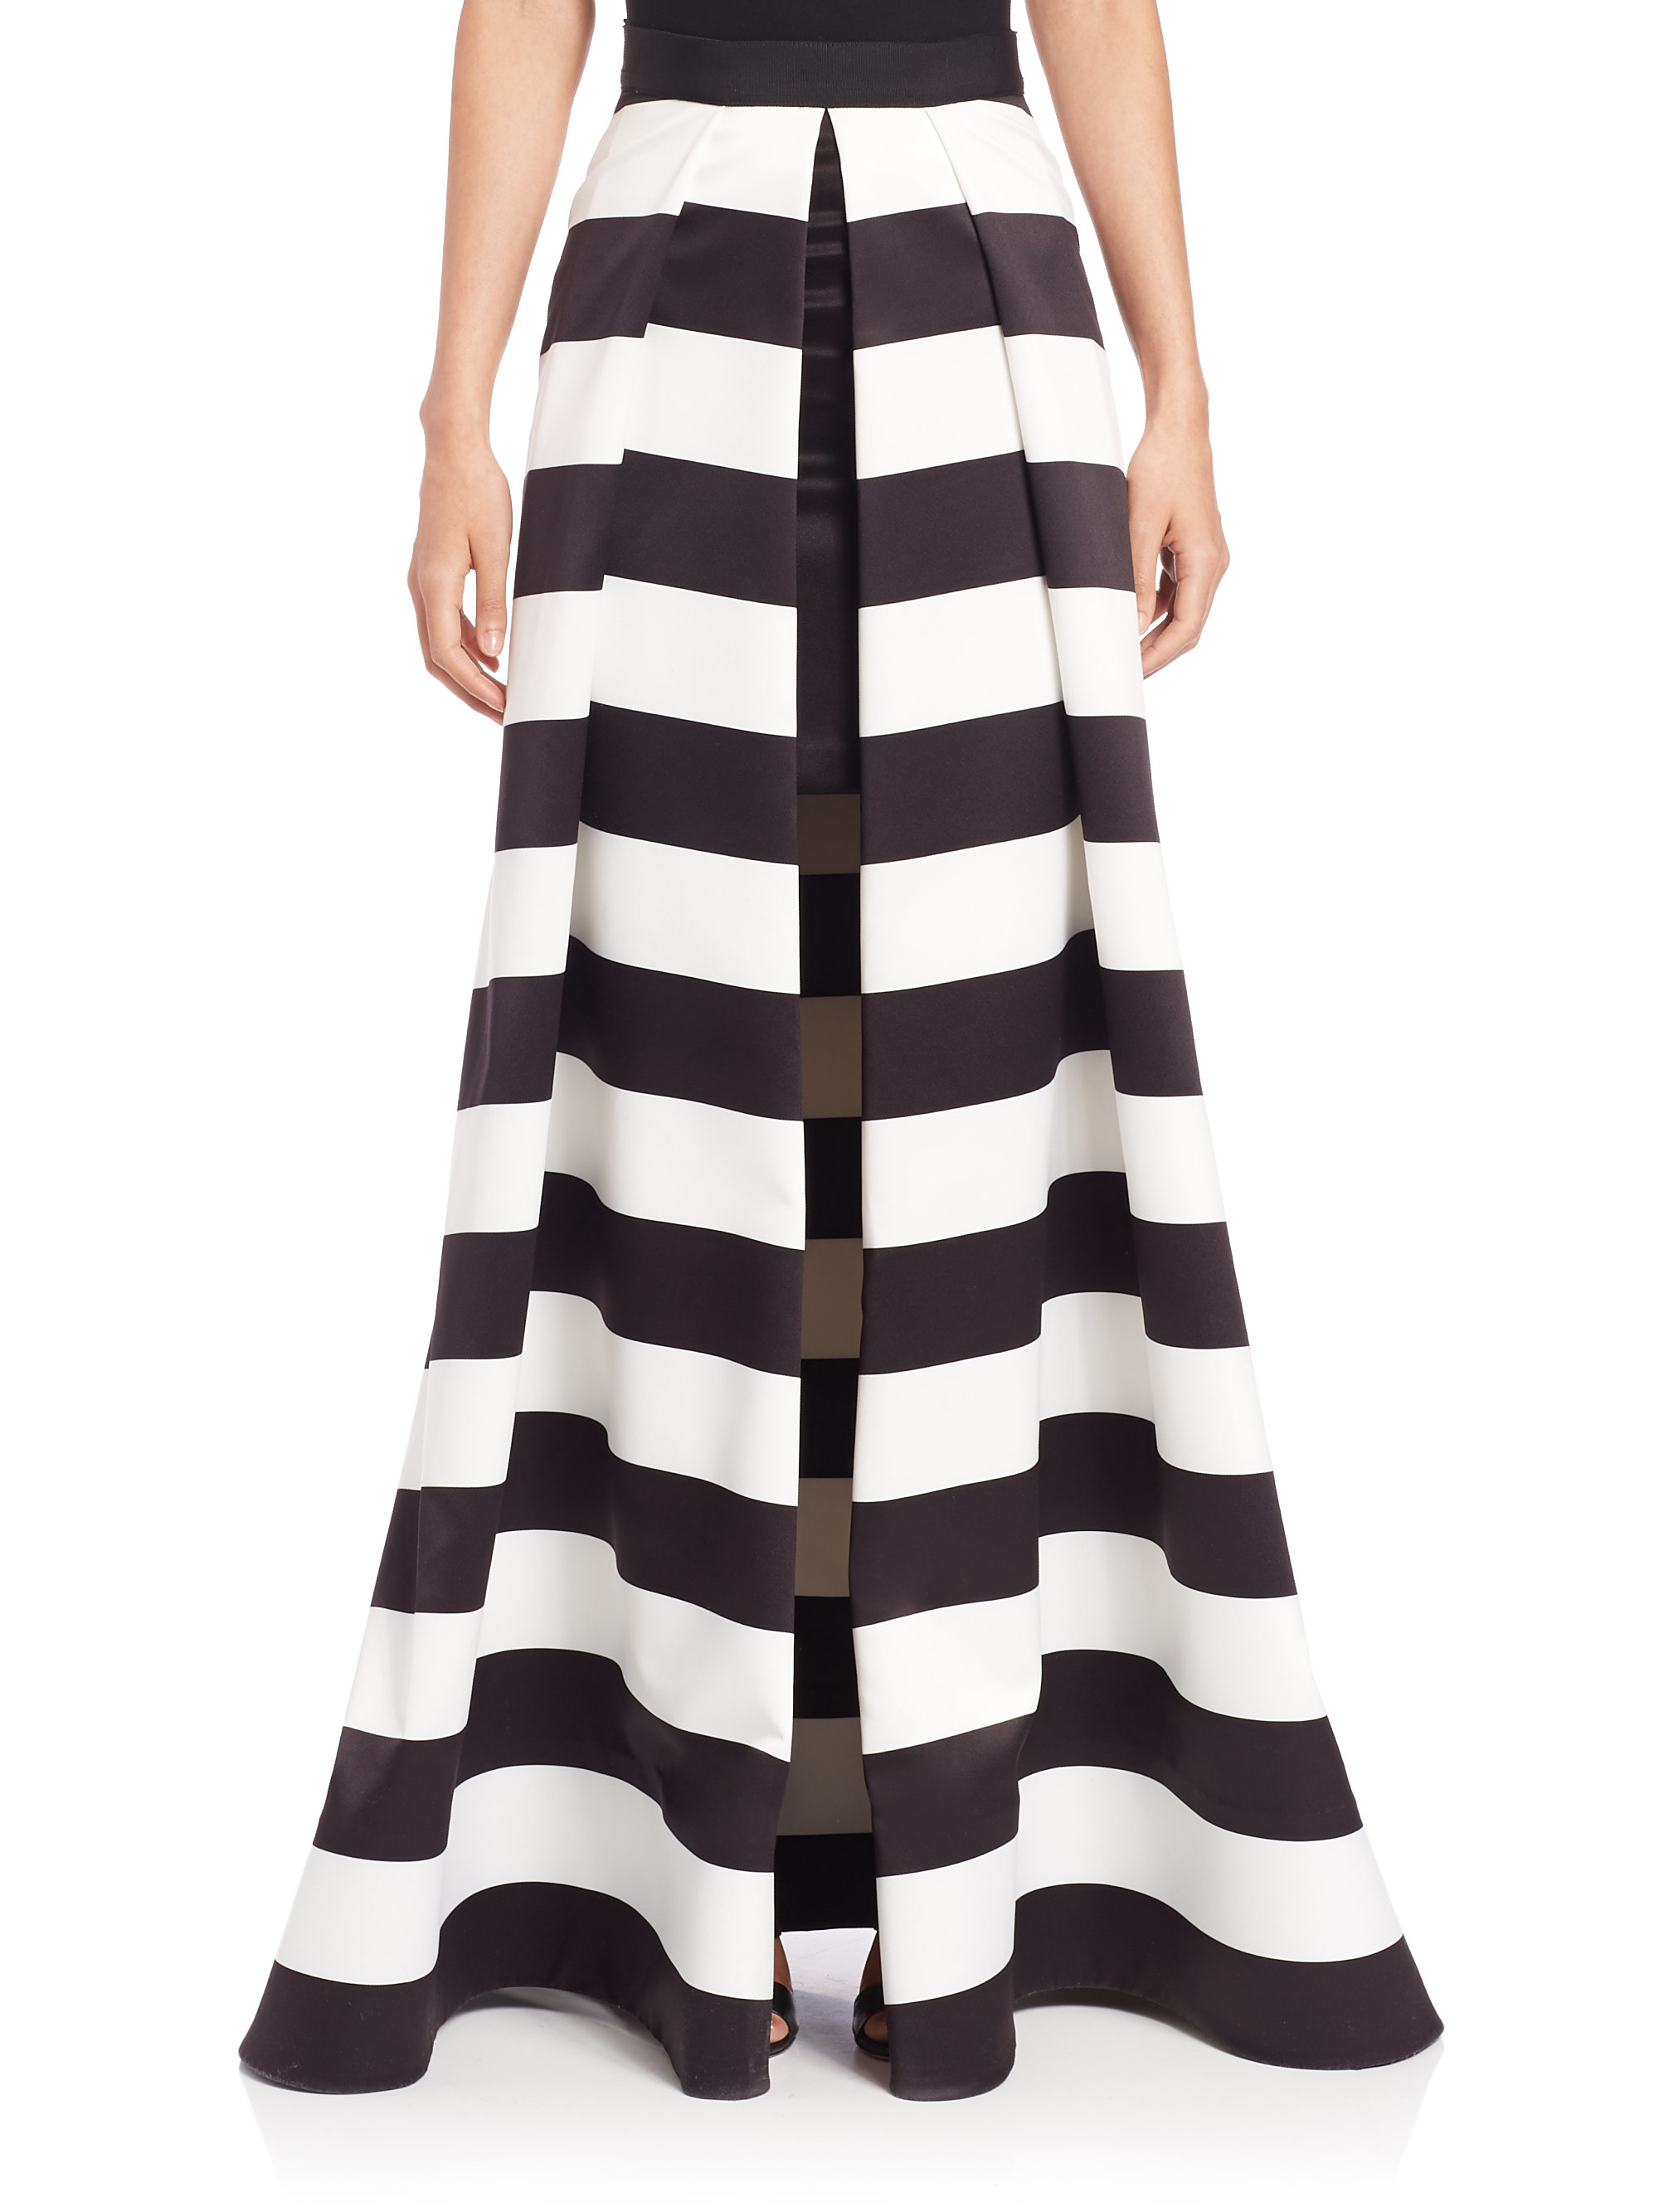 Alice + olivia Mauri Ball Skirt in Black | Lyst